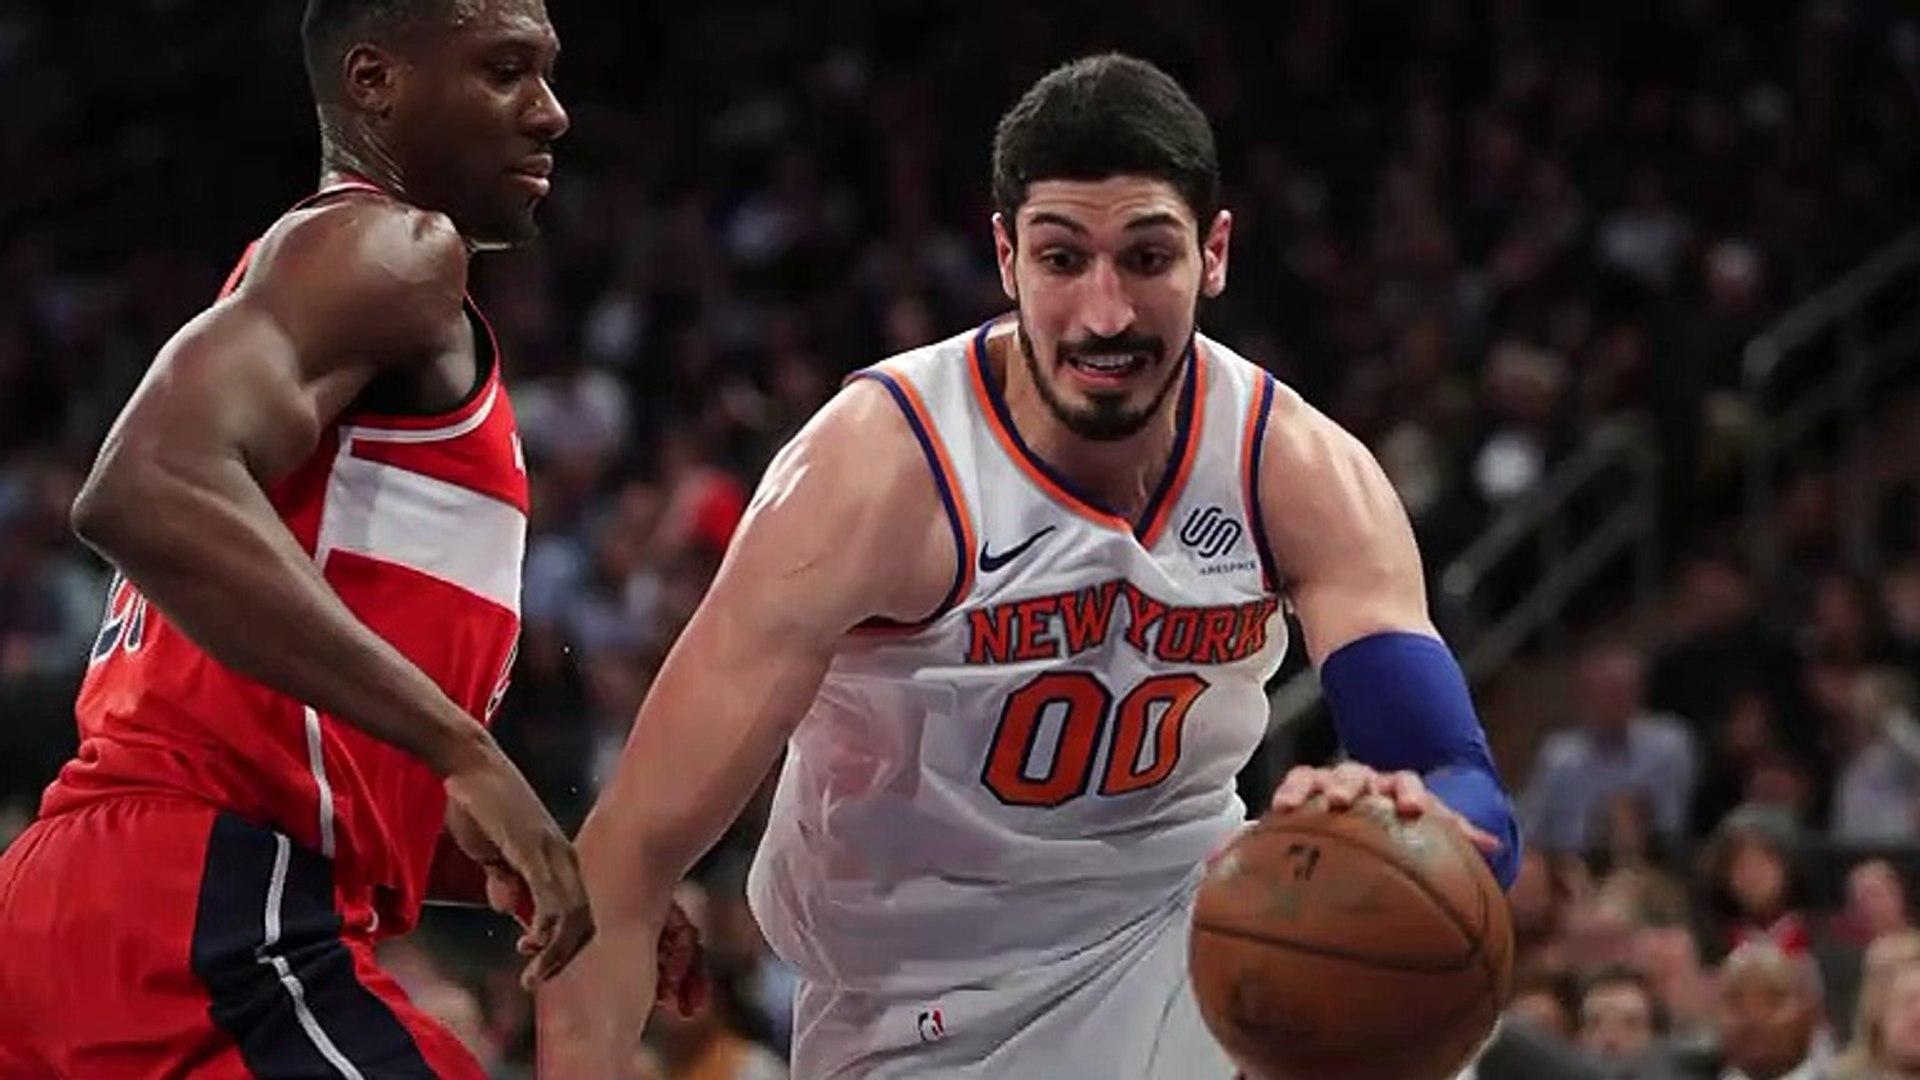 New York Knicks' Enes Kanter Will Skip London Trip Because Of 'Lunatic' Turkish Presi